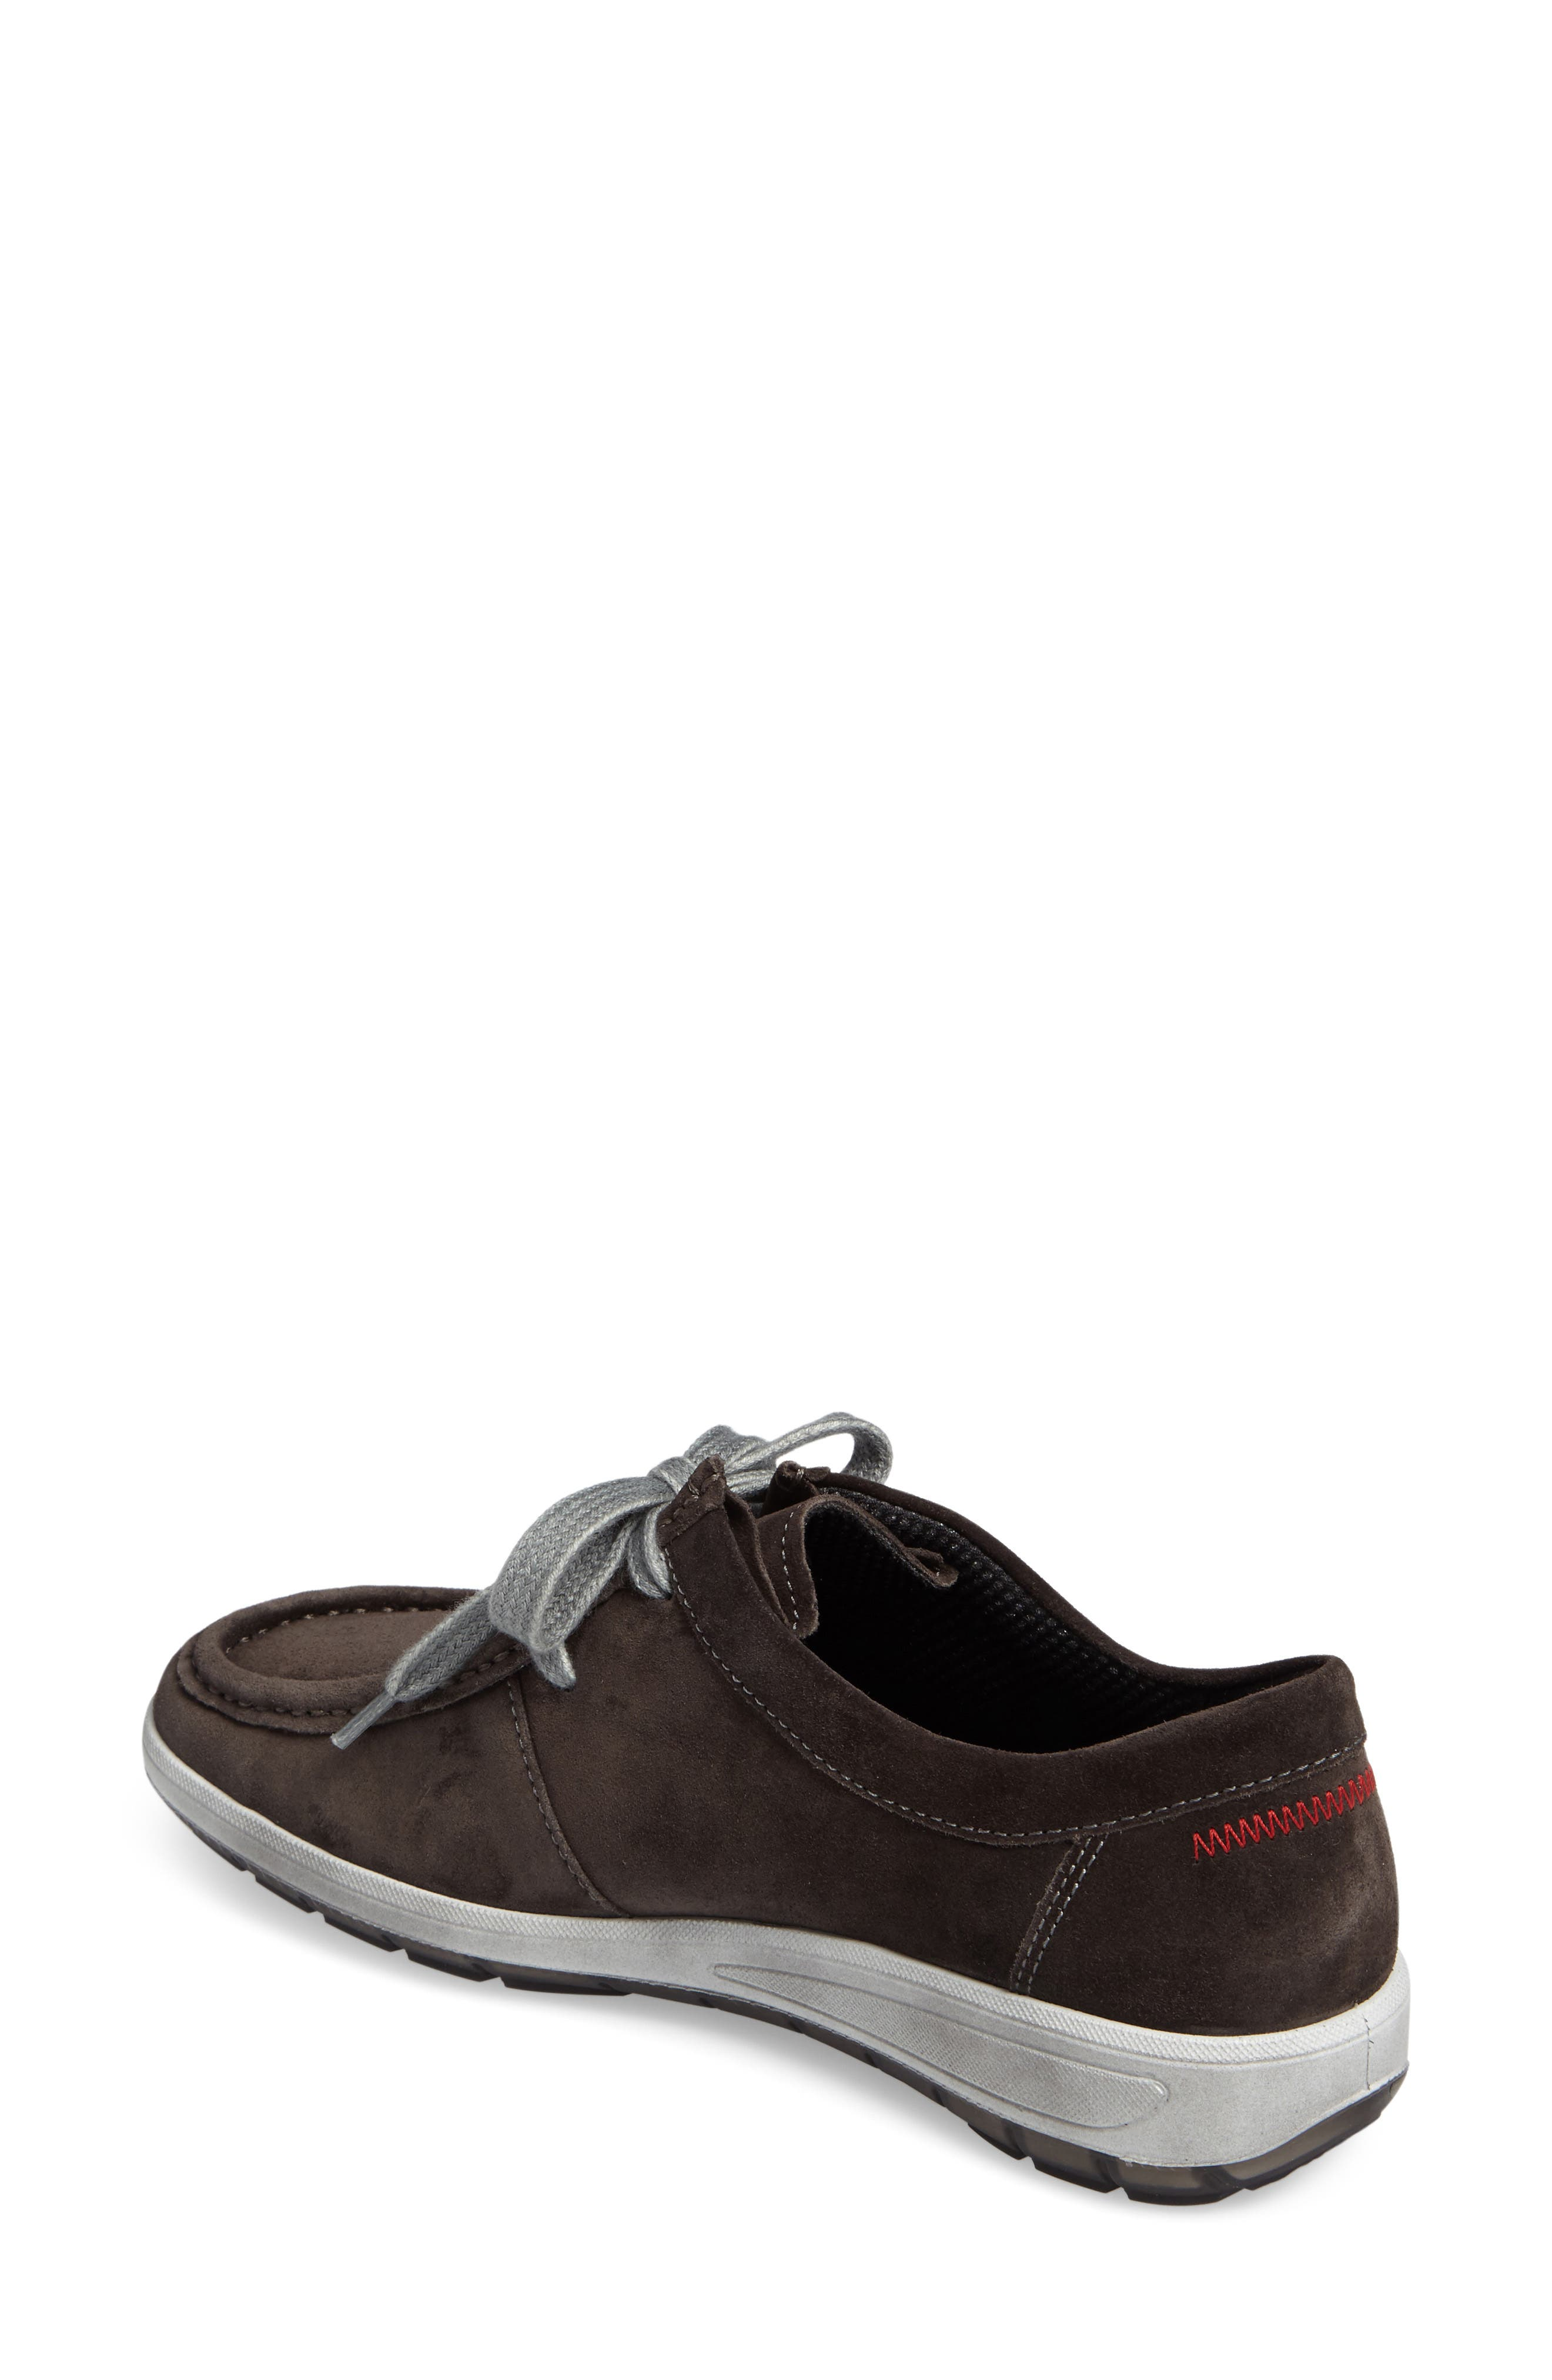 Trista Sneaker,                             Alternate thumbnail 2, color,                             LAVA SUEDE